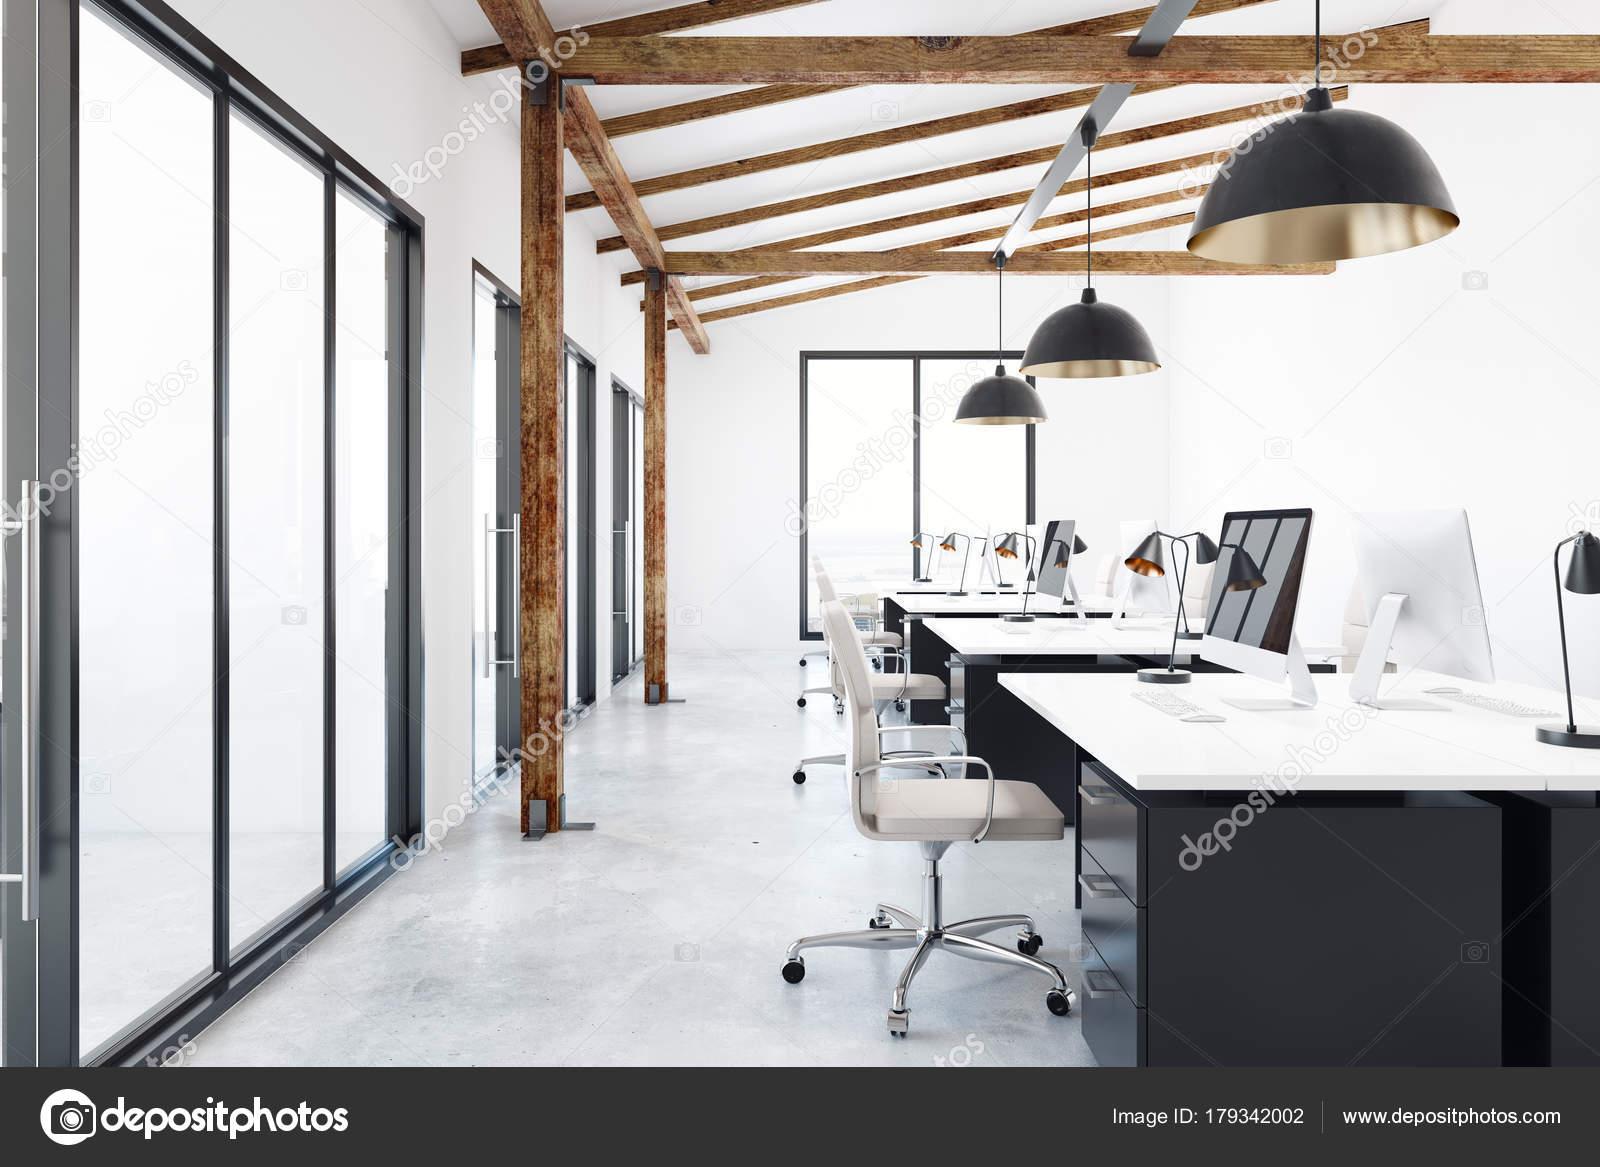 Moderne Büroeinrichtung coworking — Stockfoto © peshkova #179342002